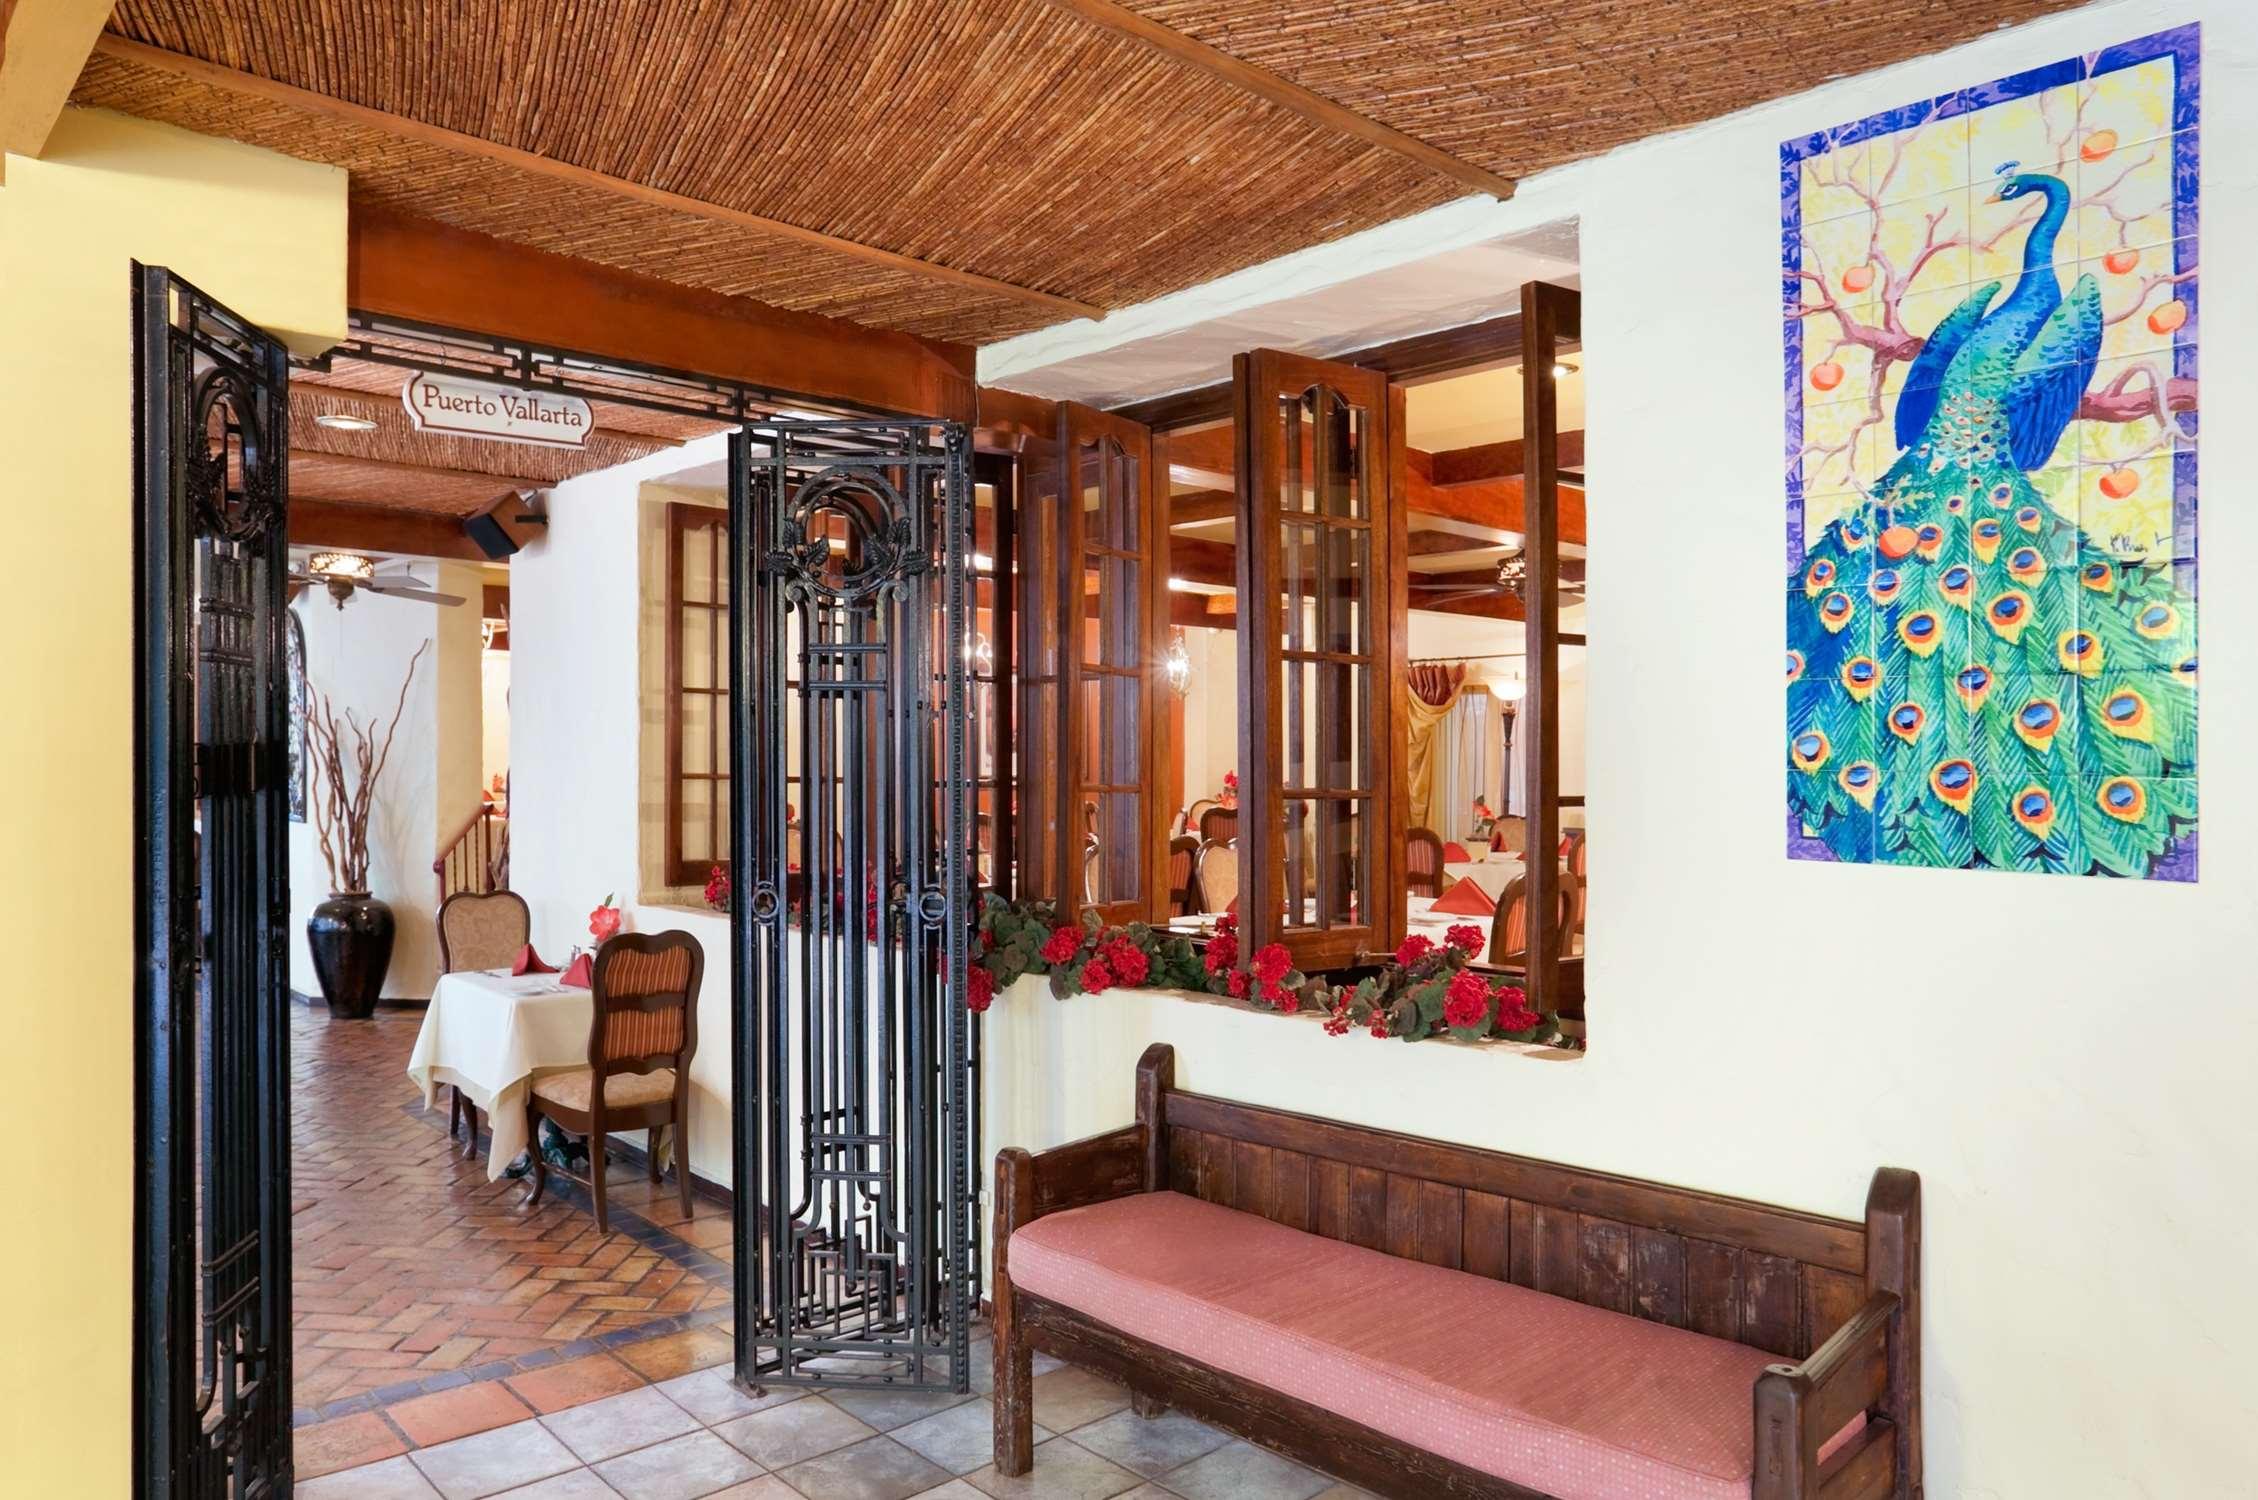 Embassy Suites by Hilton Arcadia Pasadena Area image 15